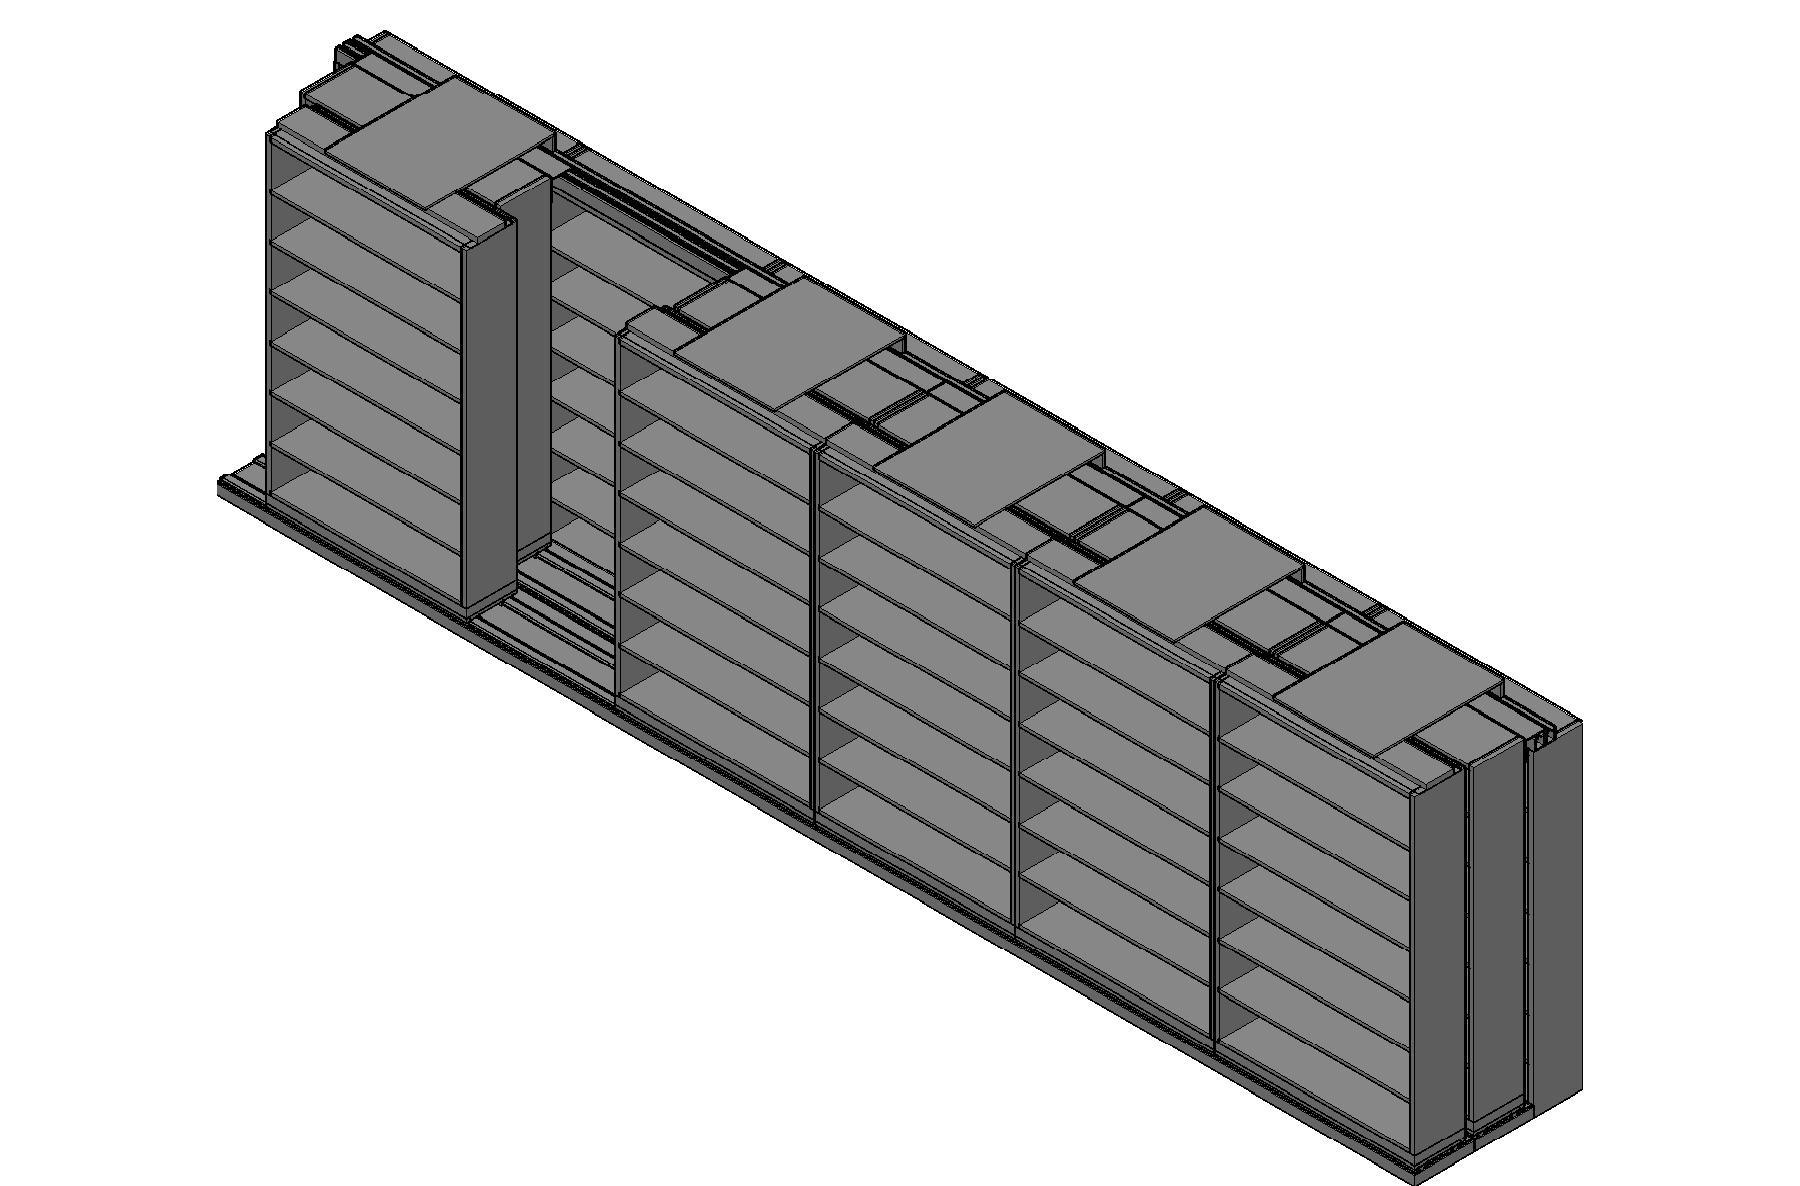 "Letter Size Sliding Shelves - 3 Rows Deep - 7 Levels - (48"" x 12"" Shelves) - 292"" Total Width"